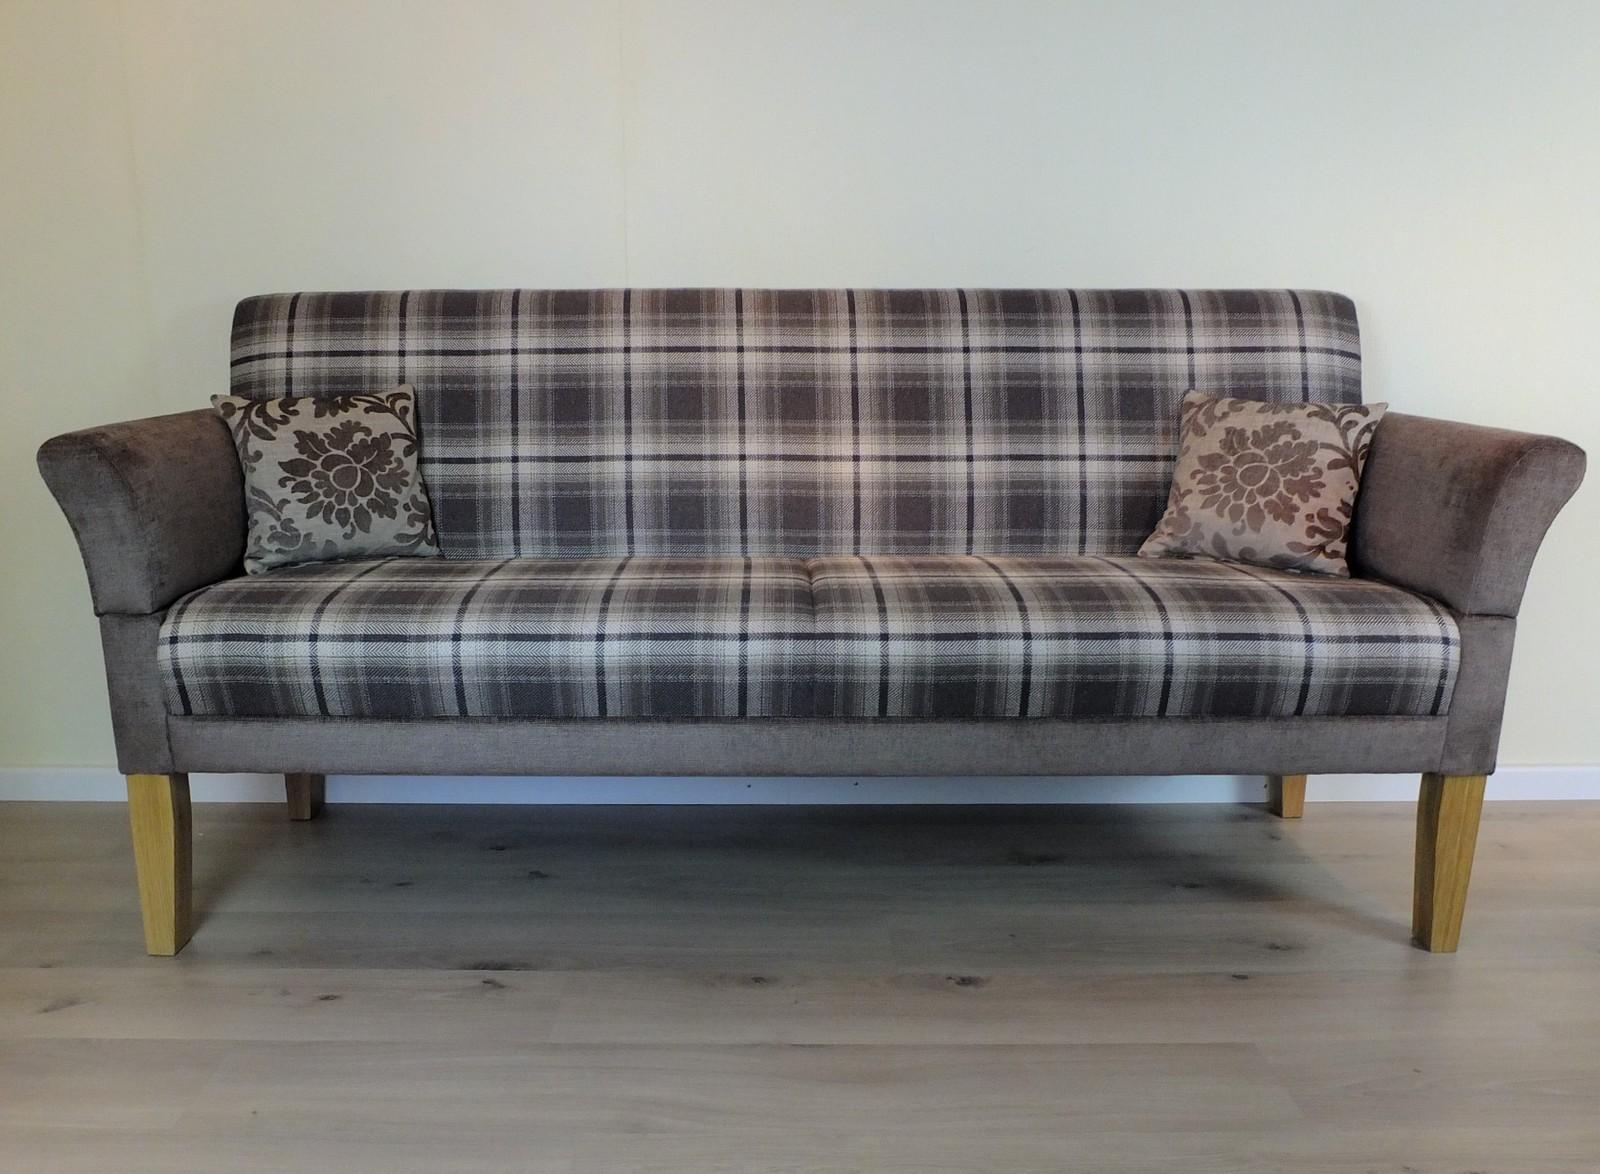 Full Size of Esszimmer Sofa Leder Vintage Sofabank 3 Sitzer Ikea Couch Grau Modern Landhausstil Samt Poco Big Innovation Berlin Höffner Neu Beziehen Lassen Zweisitzer Sofa Esszimmer Sofa